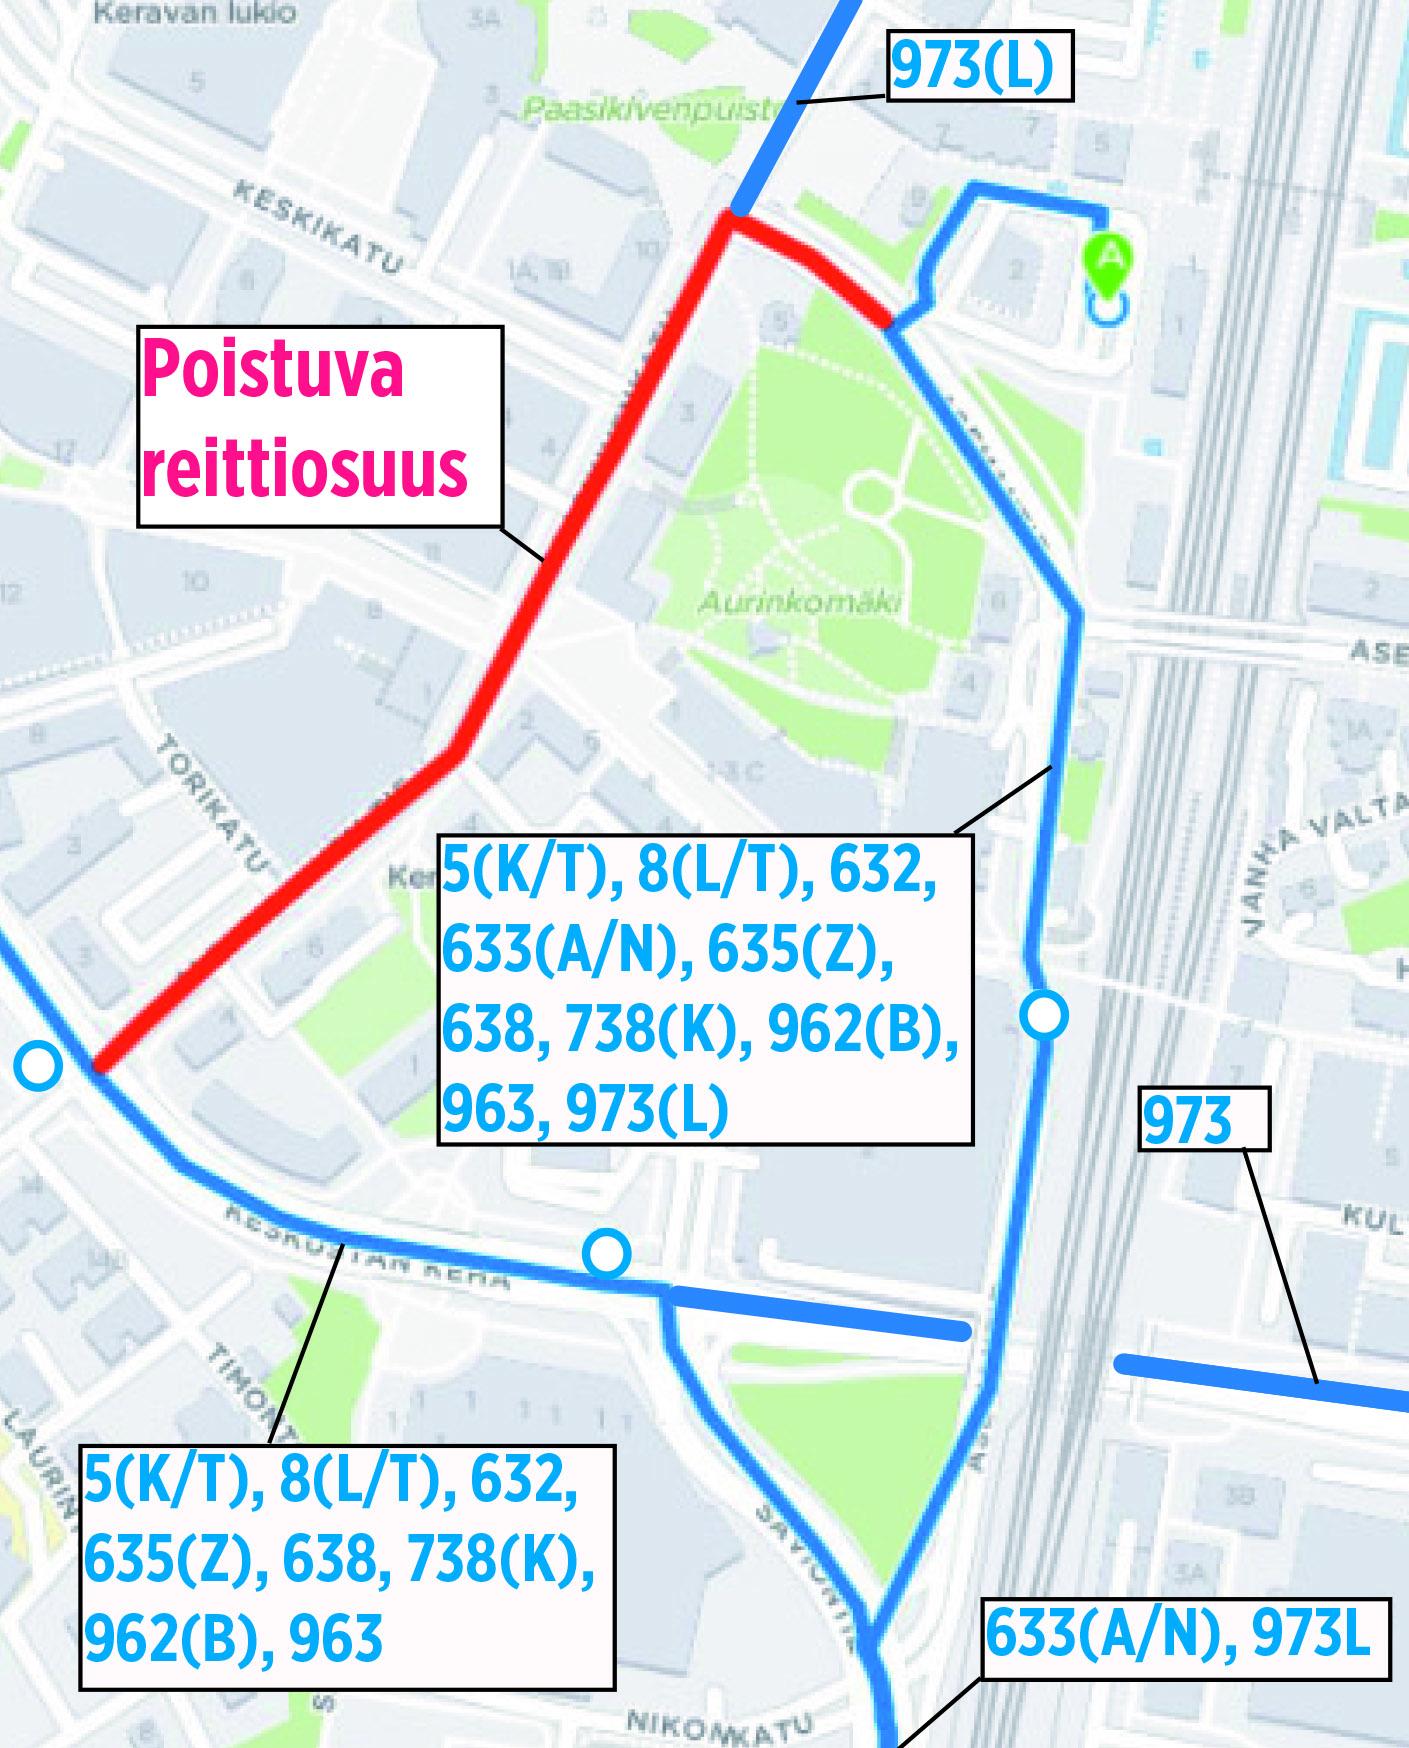 Bussien poikkeusreitit Keravalla 16.1.-17.3.2017